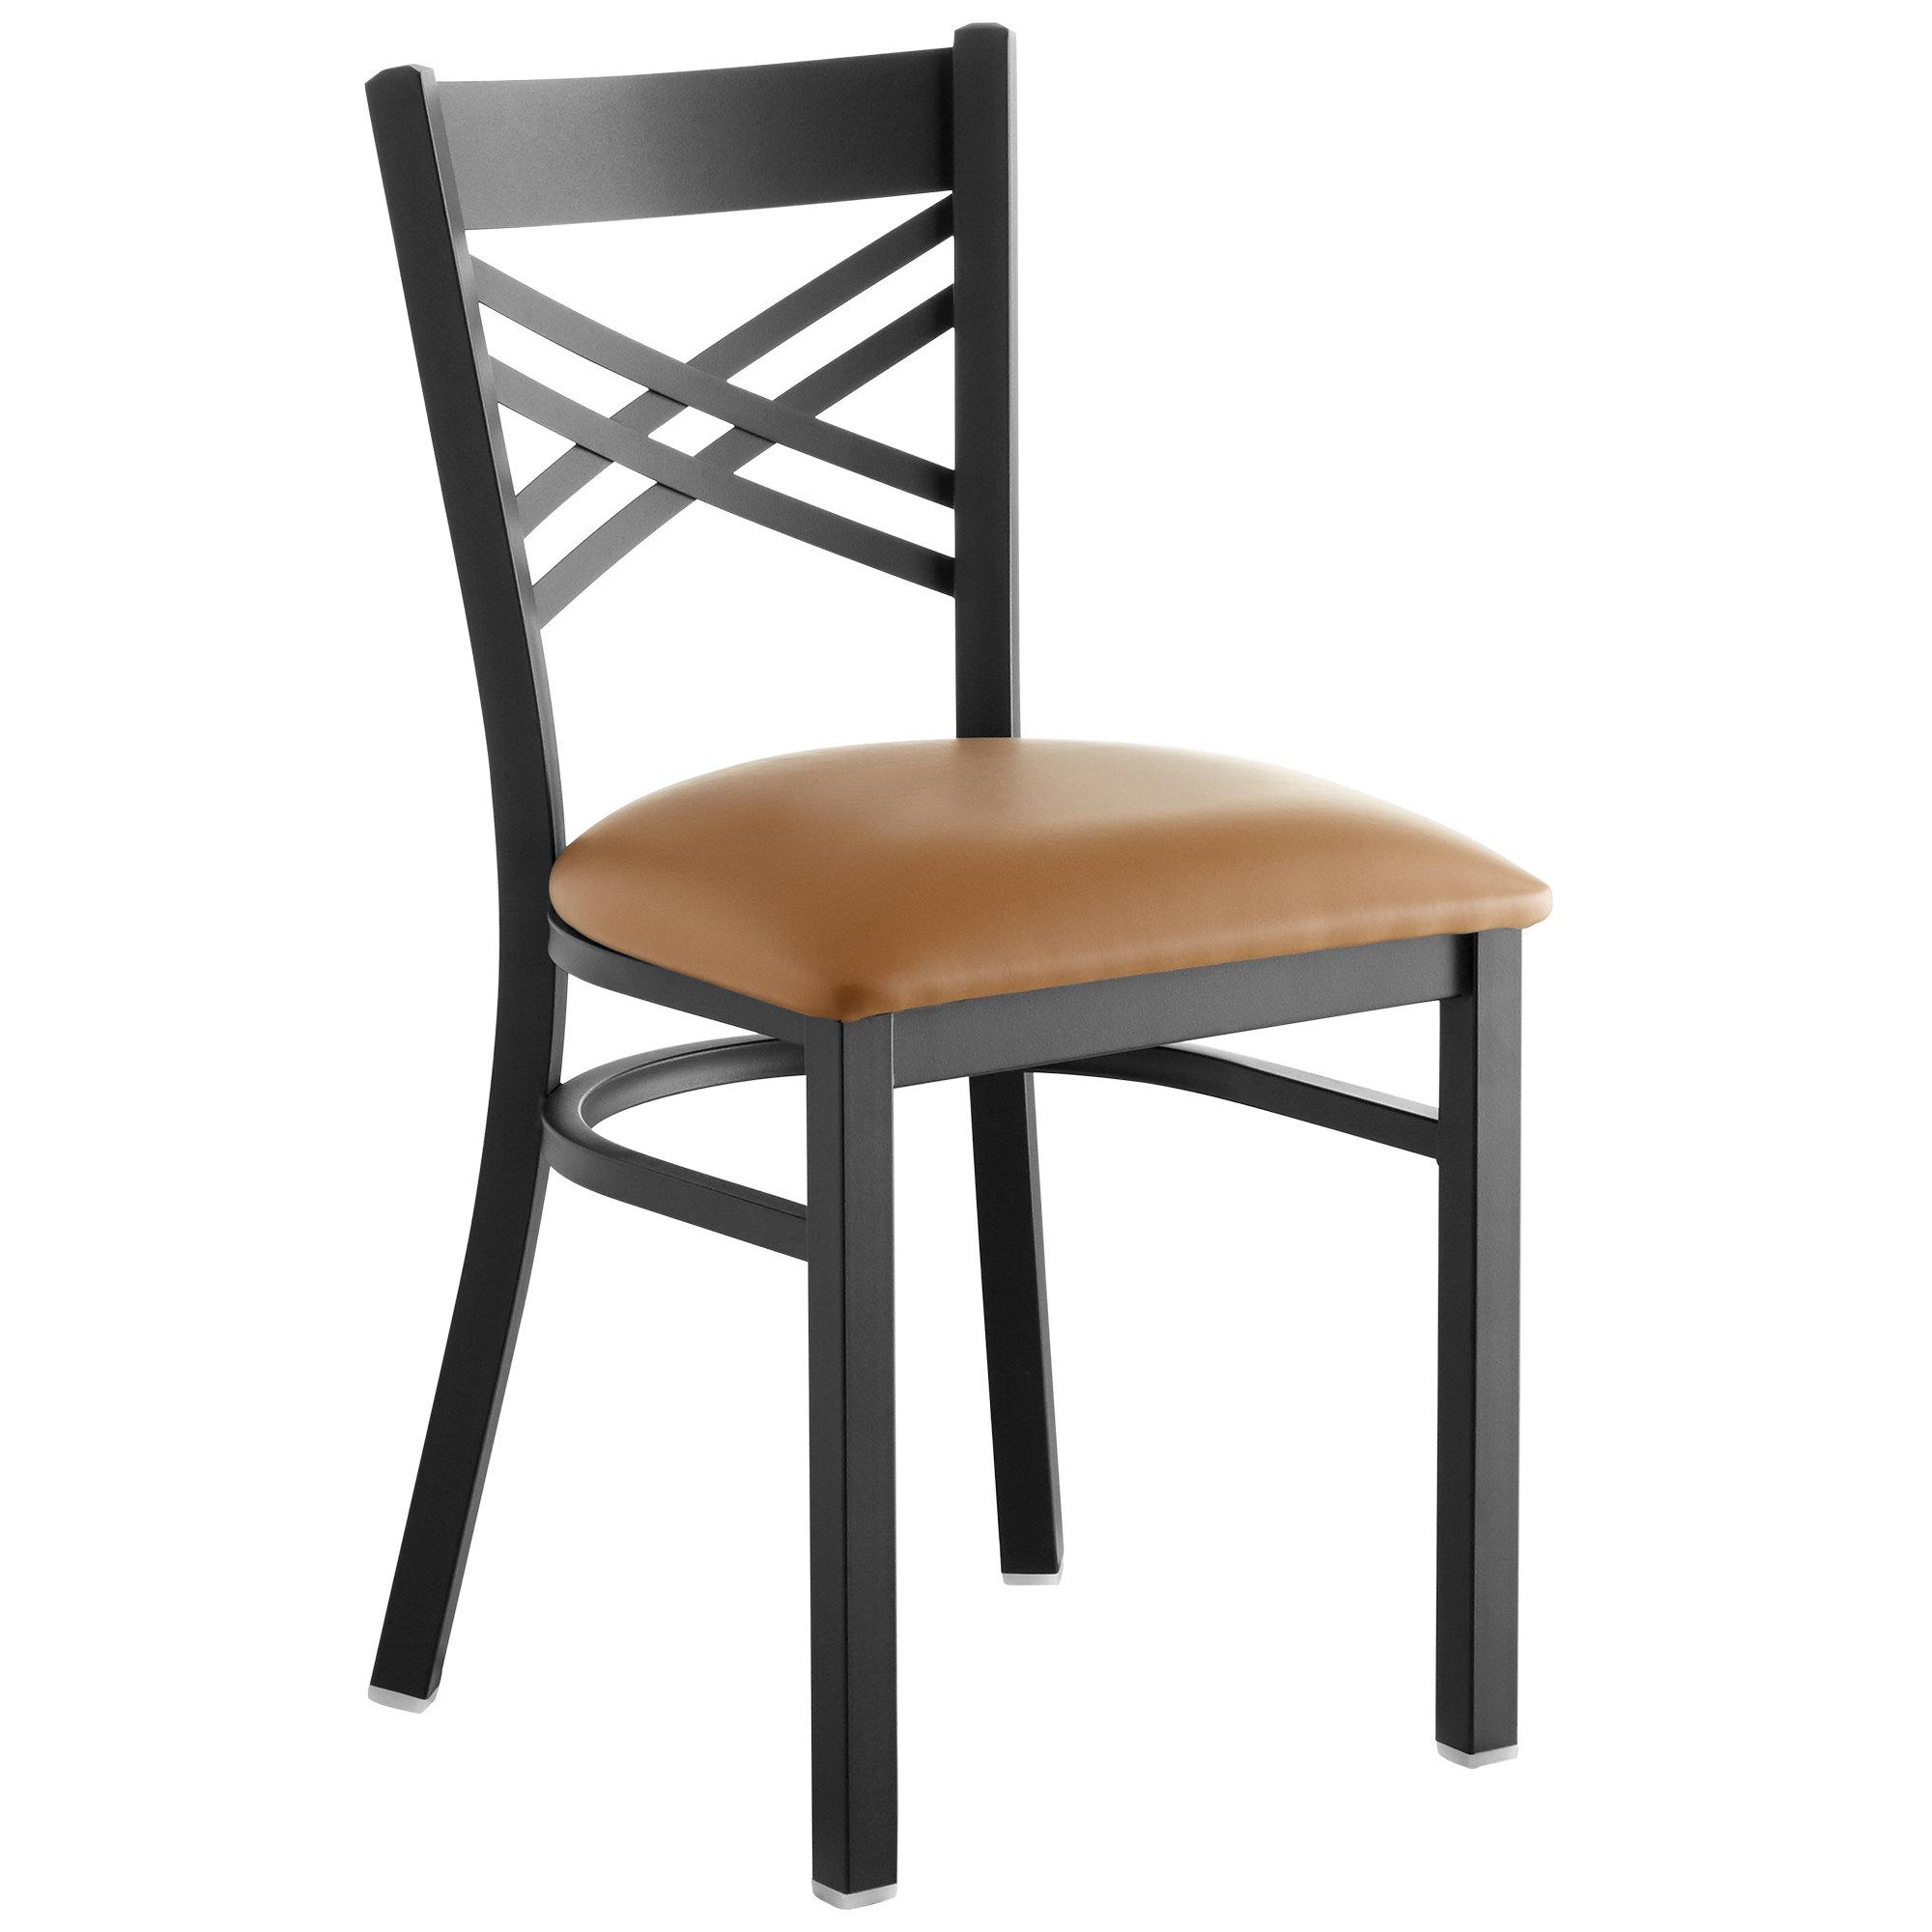 #149 - Black Cross Back Design Restaurant Metal Chair with Light Brown Vinyl Seat